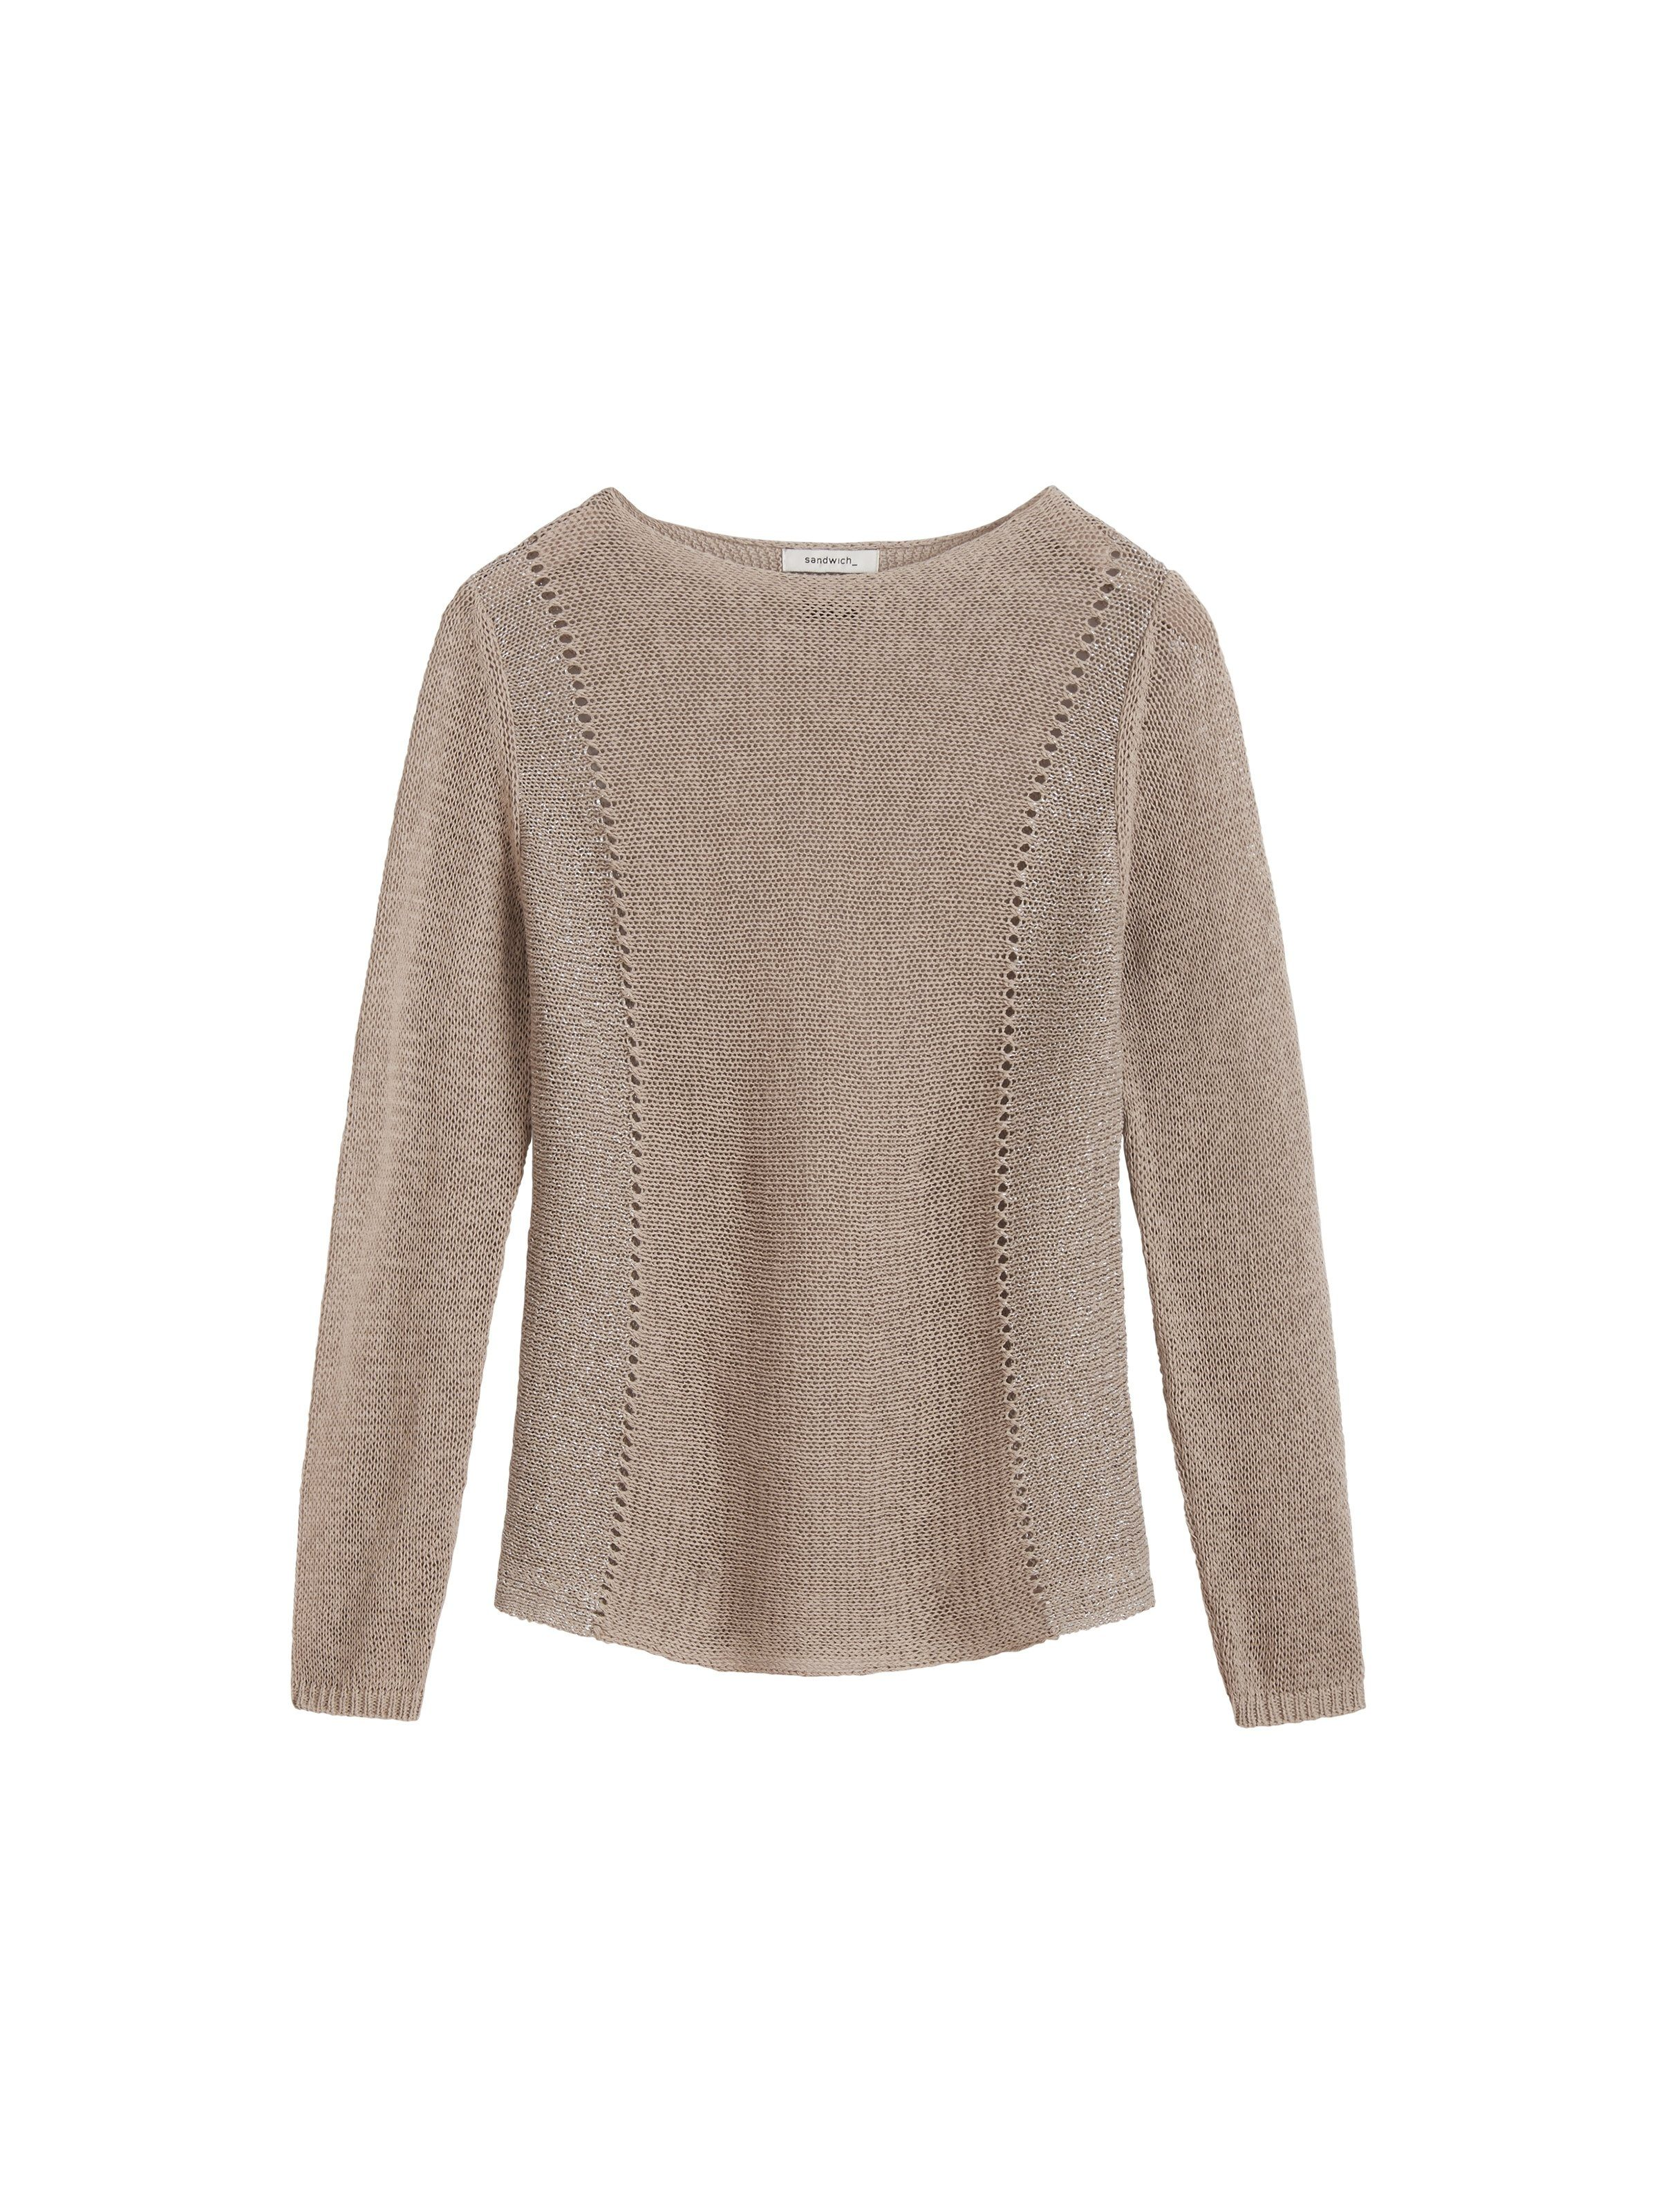 AJOUR trui kopen?   BESLIST.nl   Lage prijs